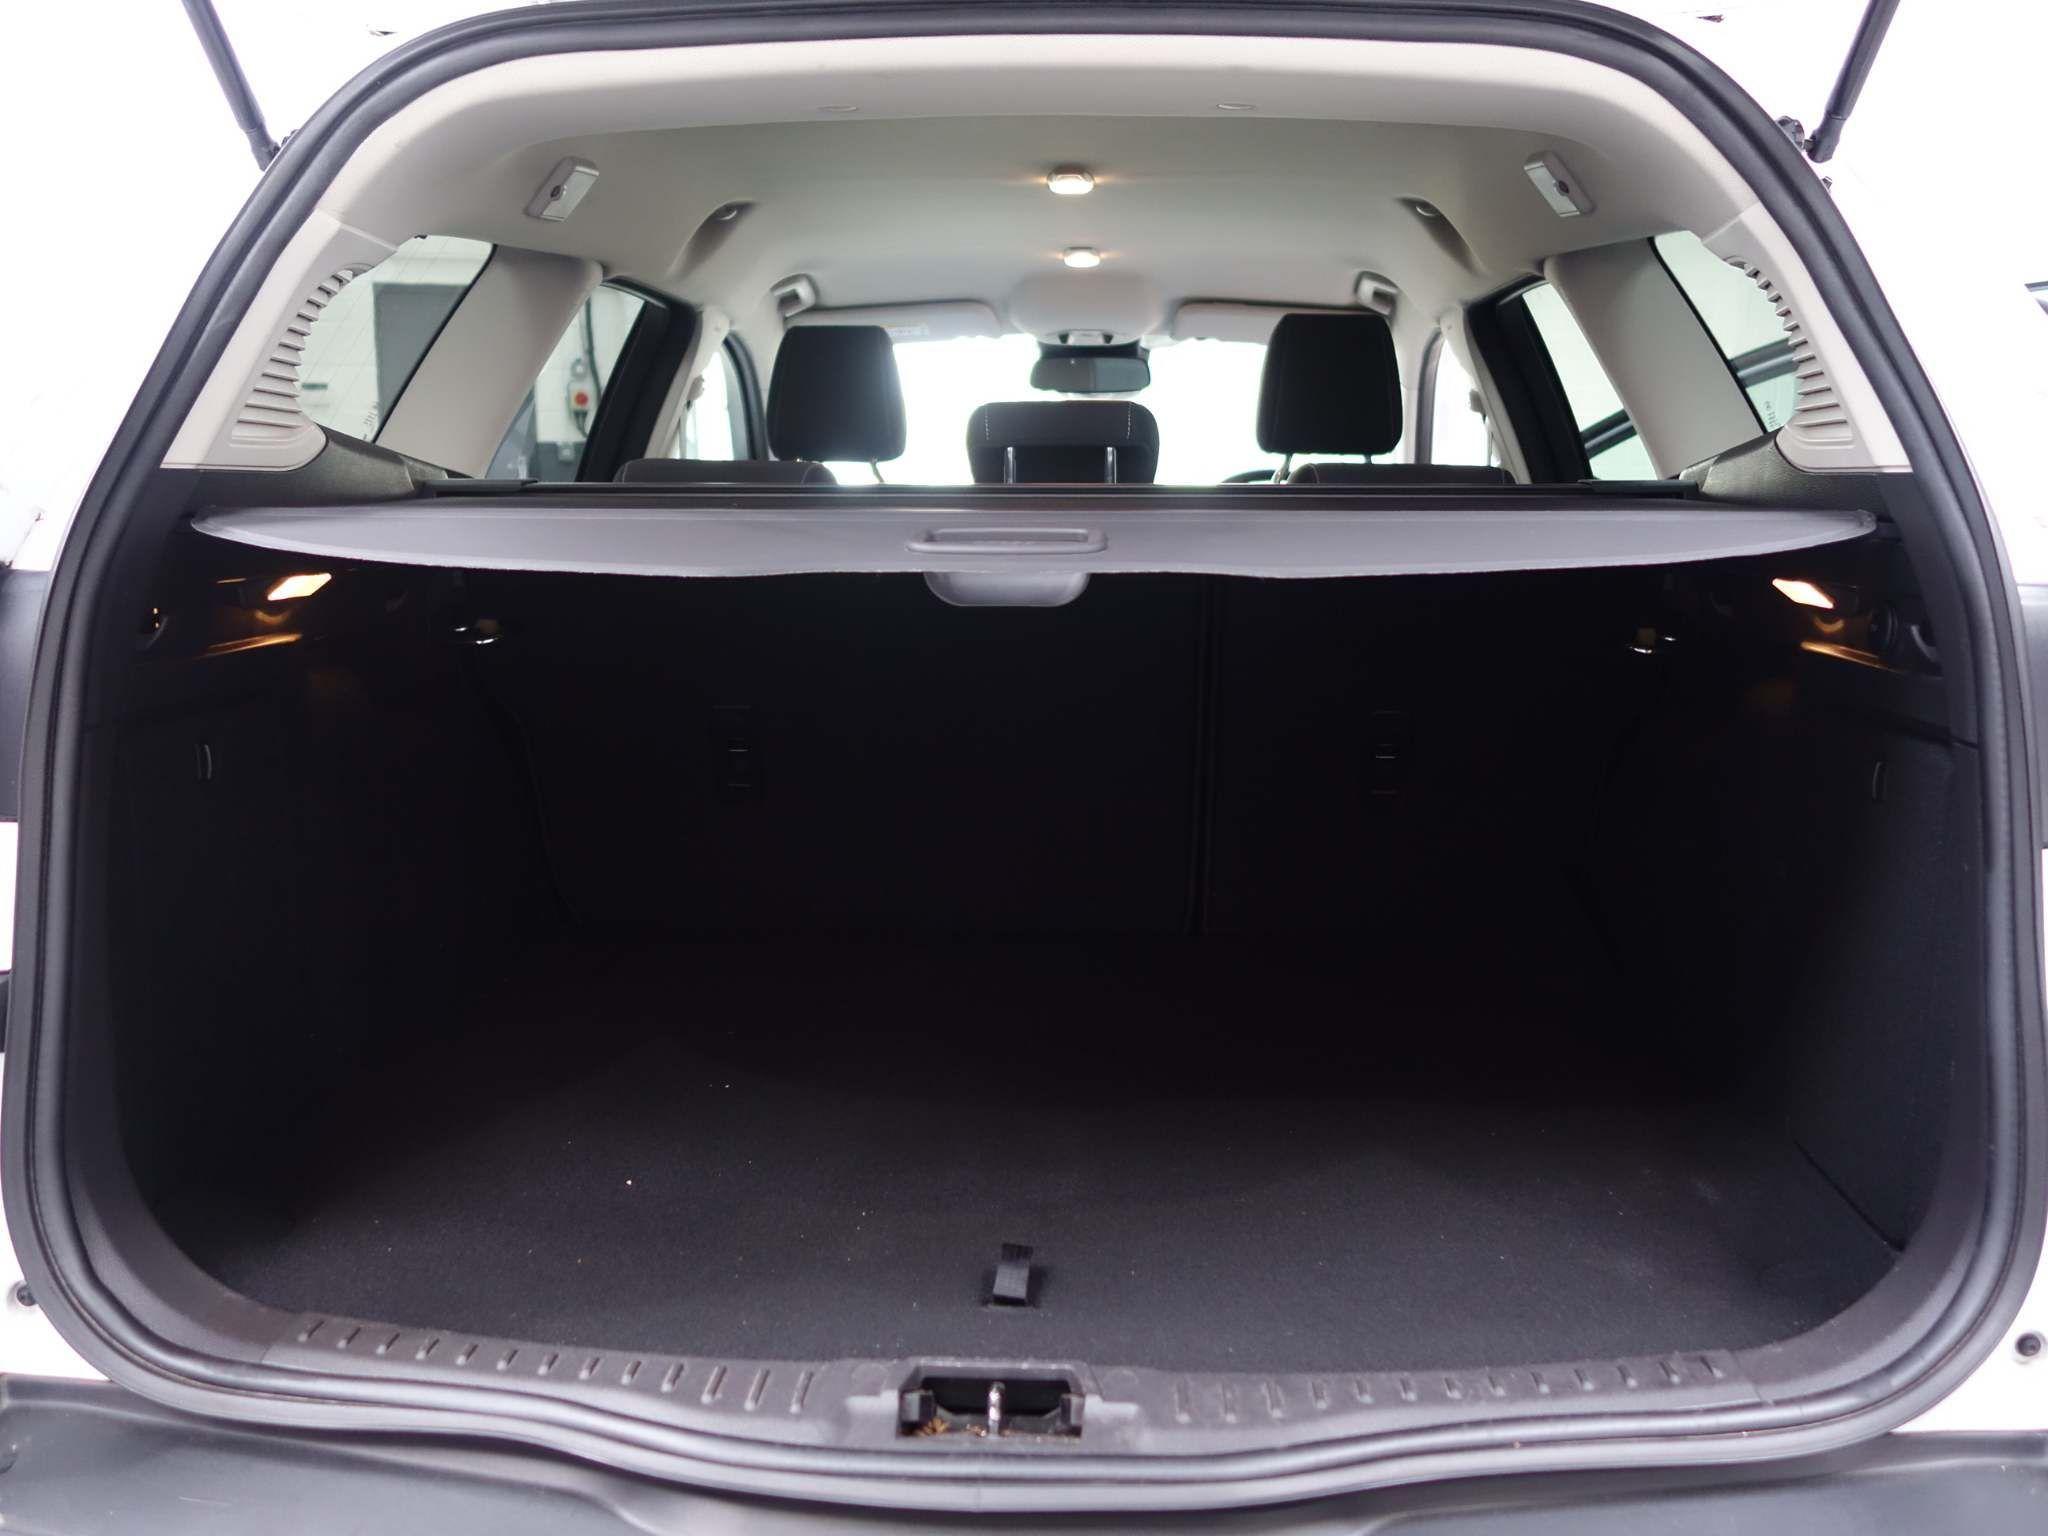 Ford Focus 1.5 TDCi Zetec Edition (s/s) 5dr – WG17AWX